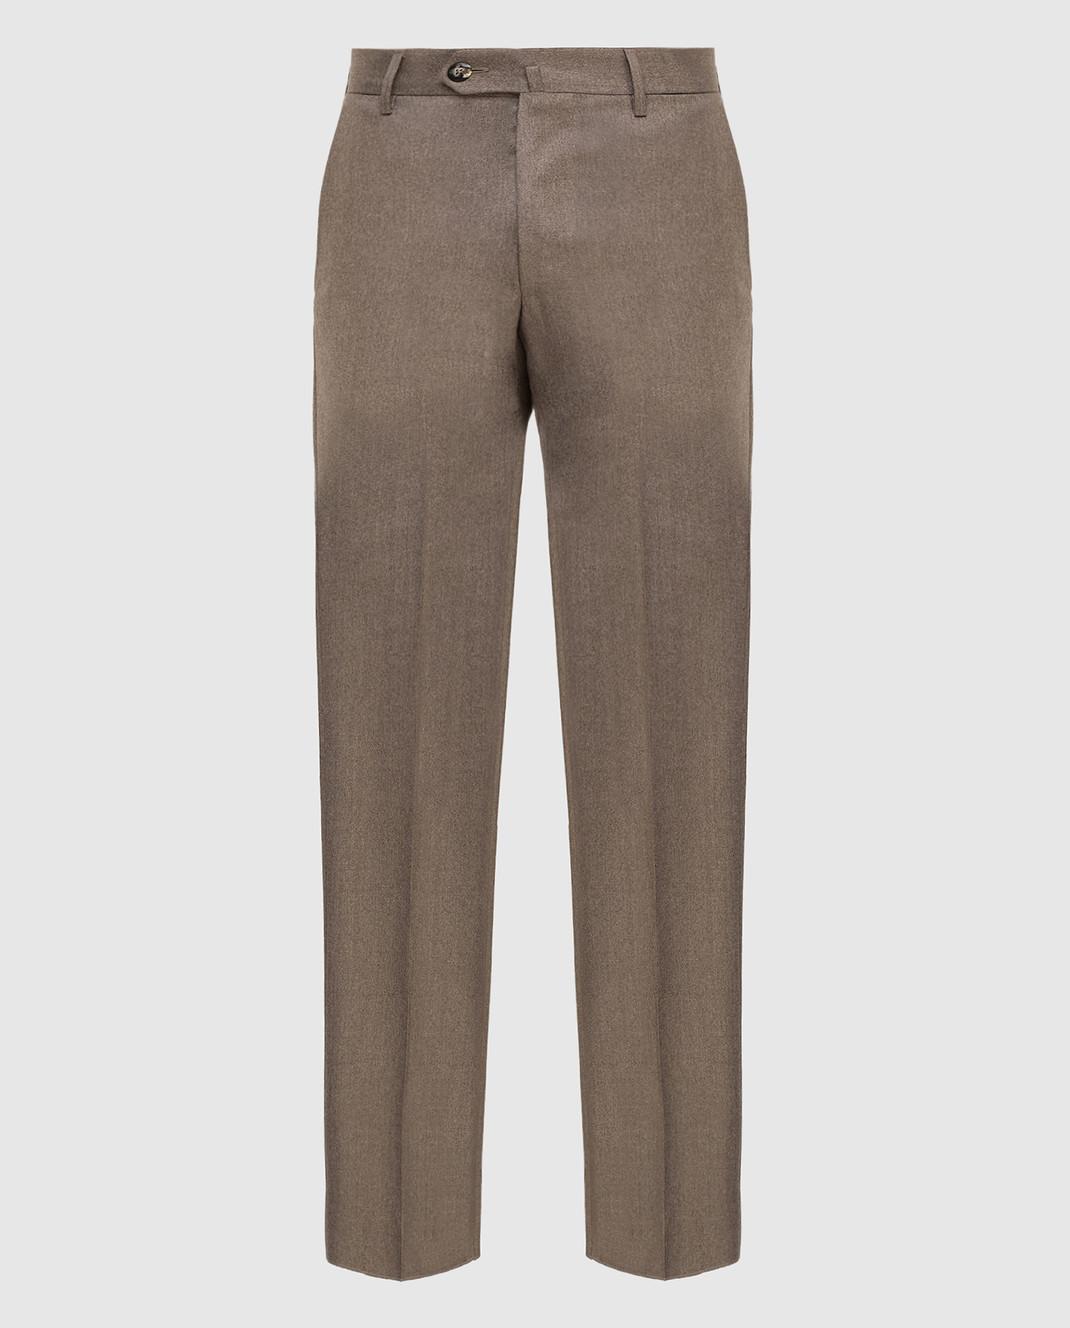 Castello d'Oro Бежевые брюки из шерсти изображение 1